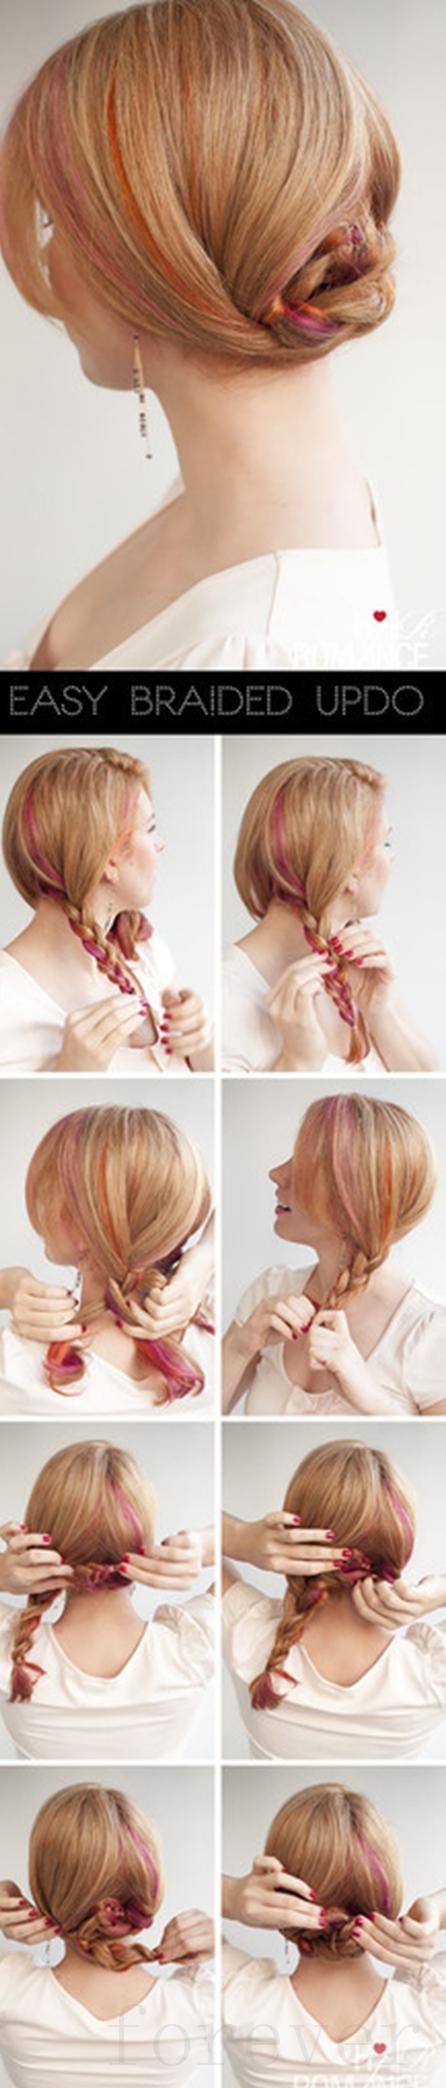 Long hair style for women hair pinterest long hair styles